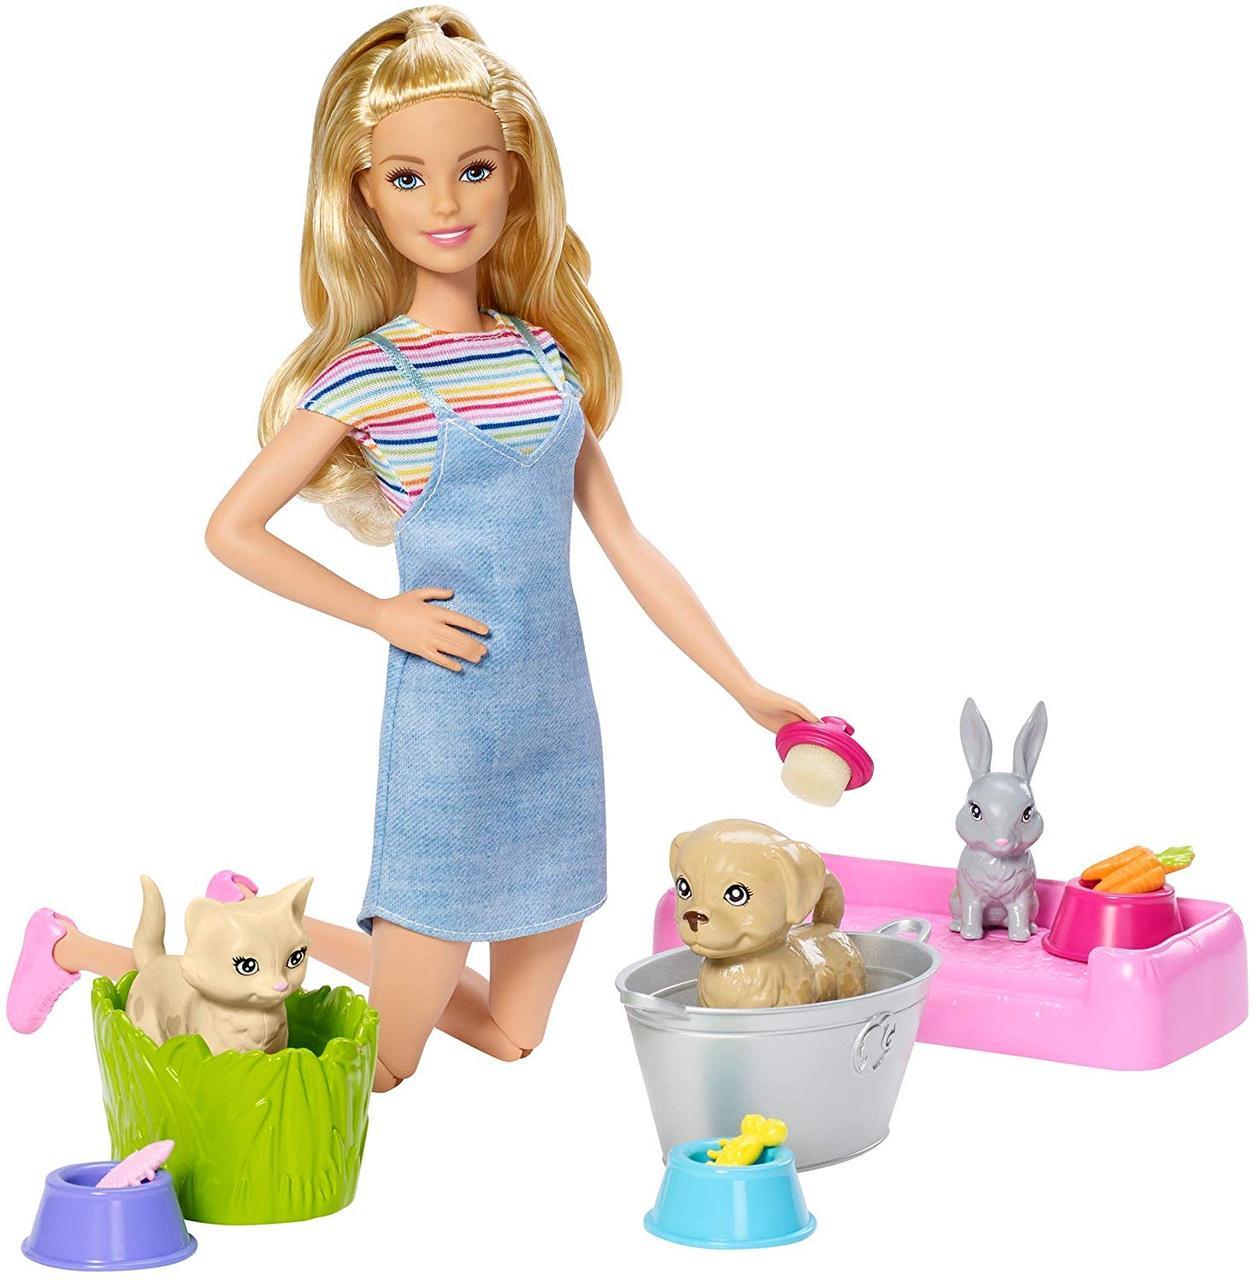 Кукла Барби с питомцами Купай и играй barbie wash n play